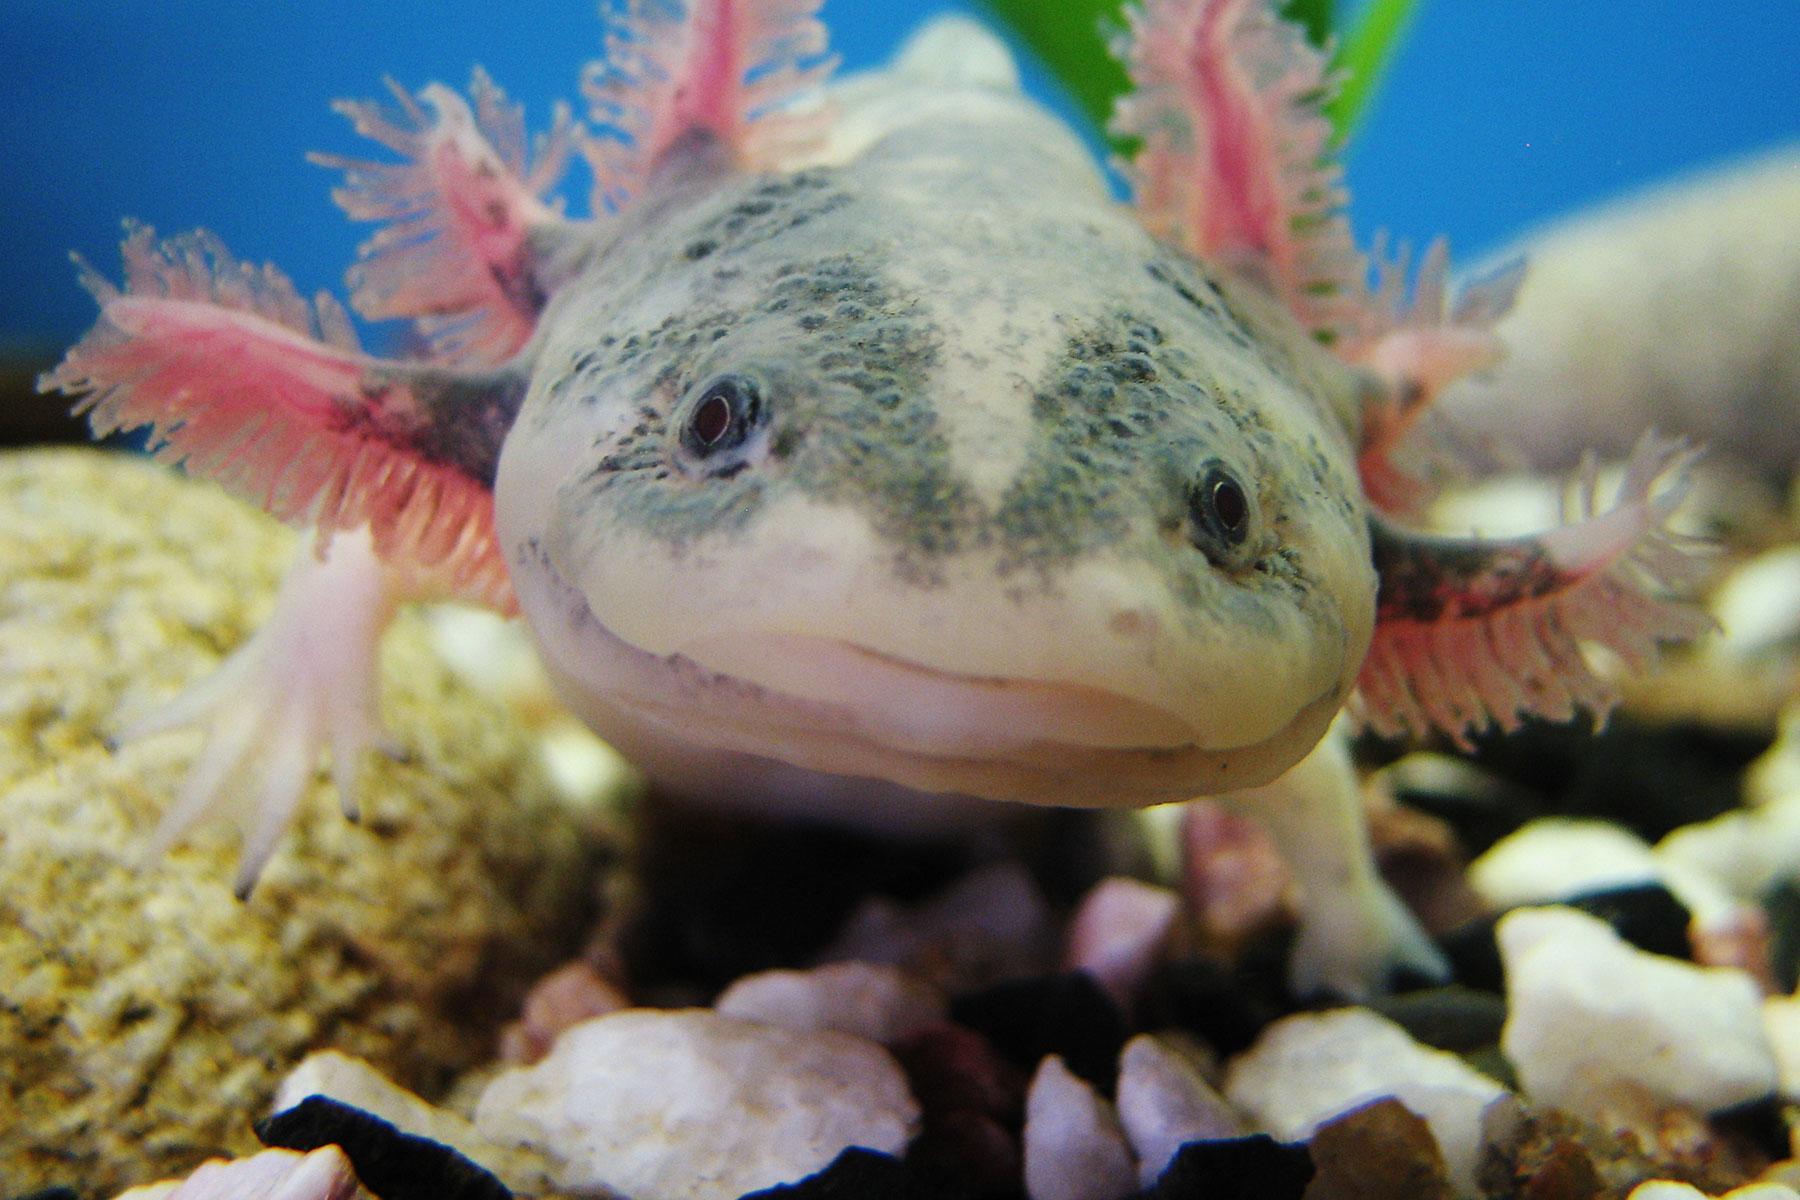 Where to See the Worlds 10 Weirdest Animals - Fodors